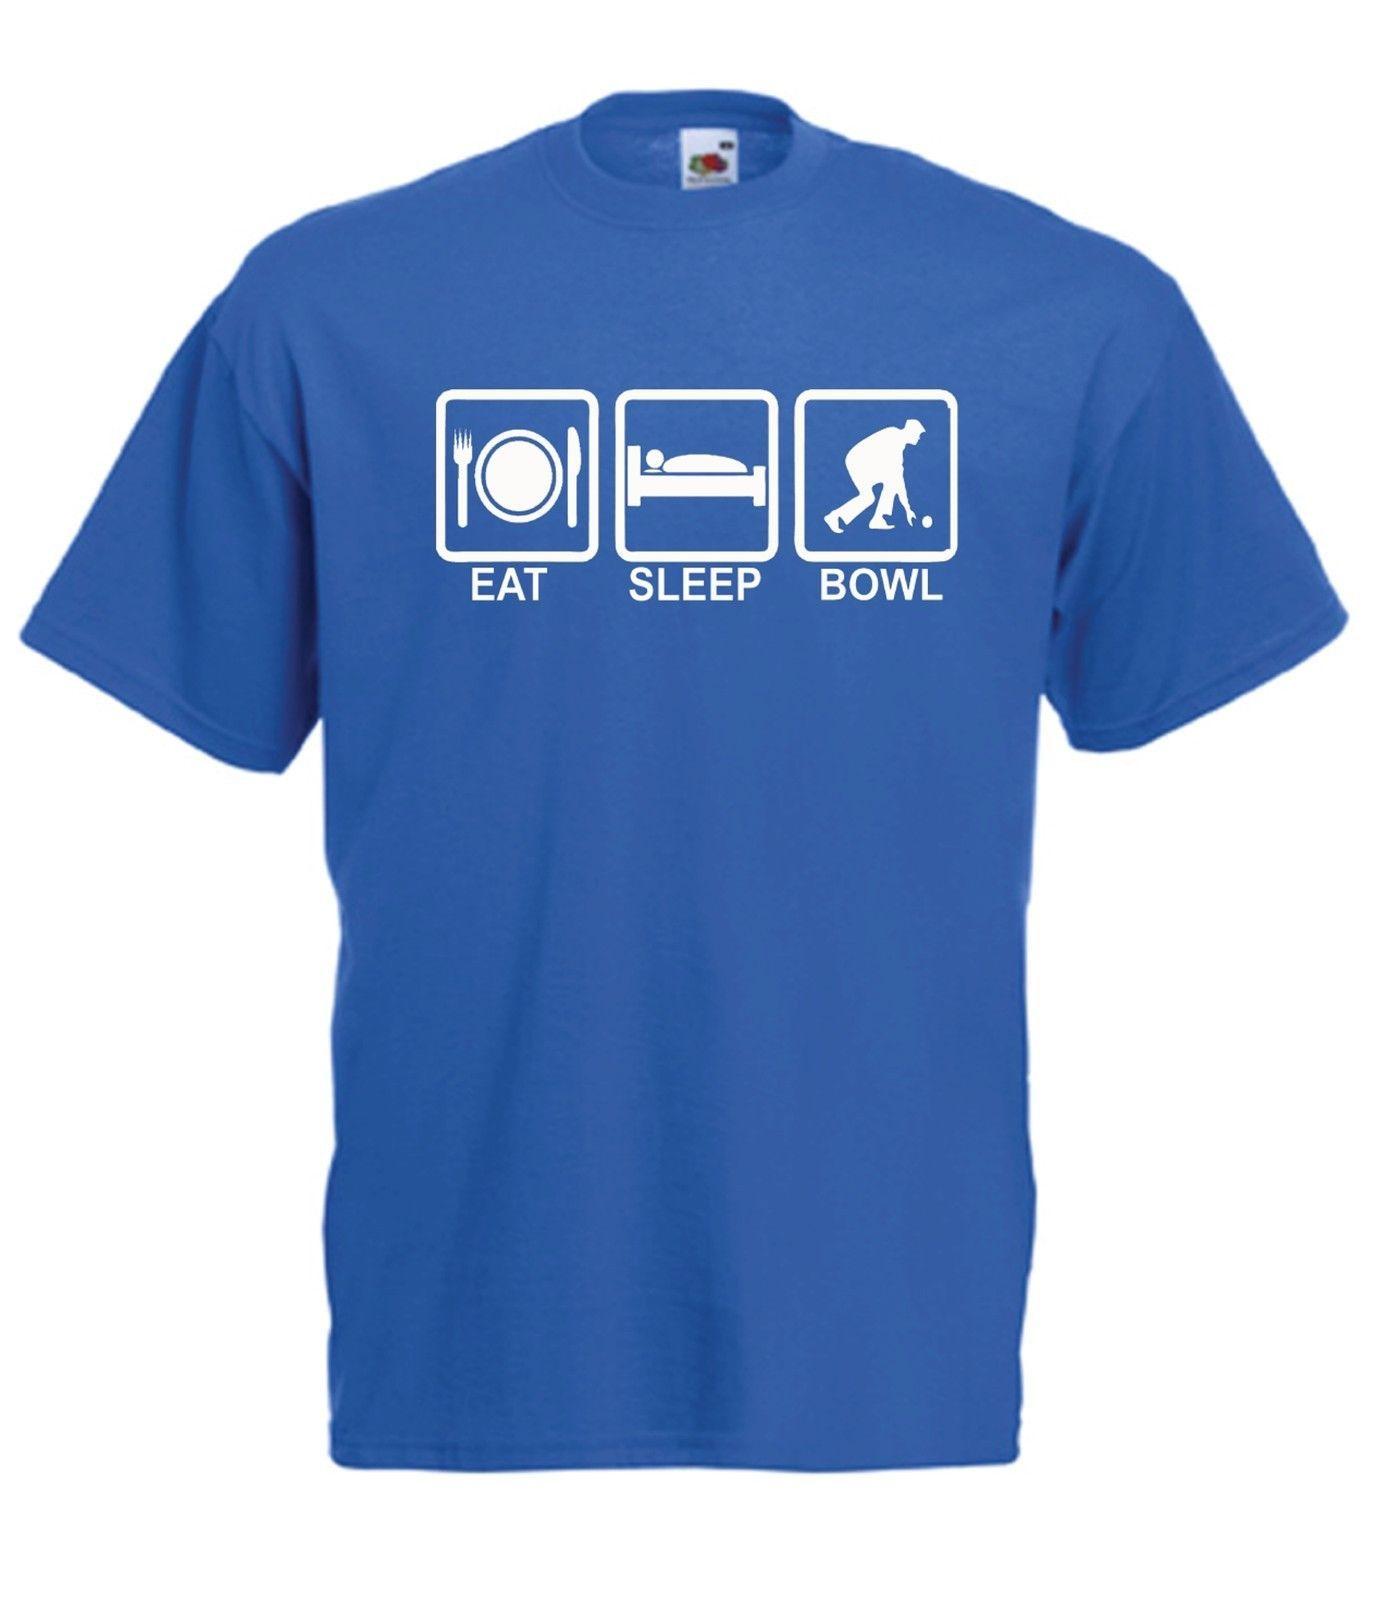 d5e275ebf2 EAT SLEEP BOWLS FUNNY BOWLING Fathers Xmas Birthday Gift New Mens Womens T  SHIRT Funny Unisex Casual Tee Gift Online Tshirt Shopping Artistic T Shirts  From ...